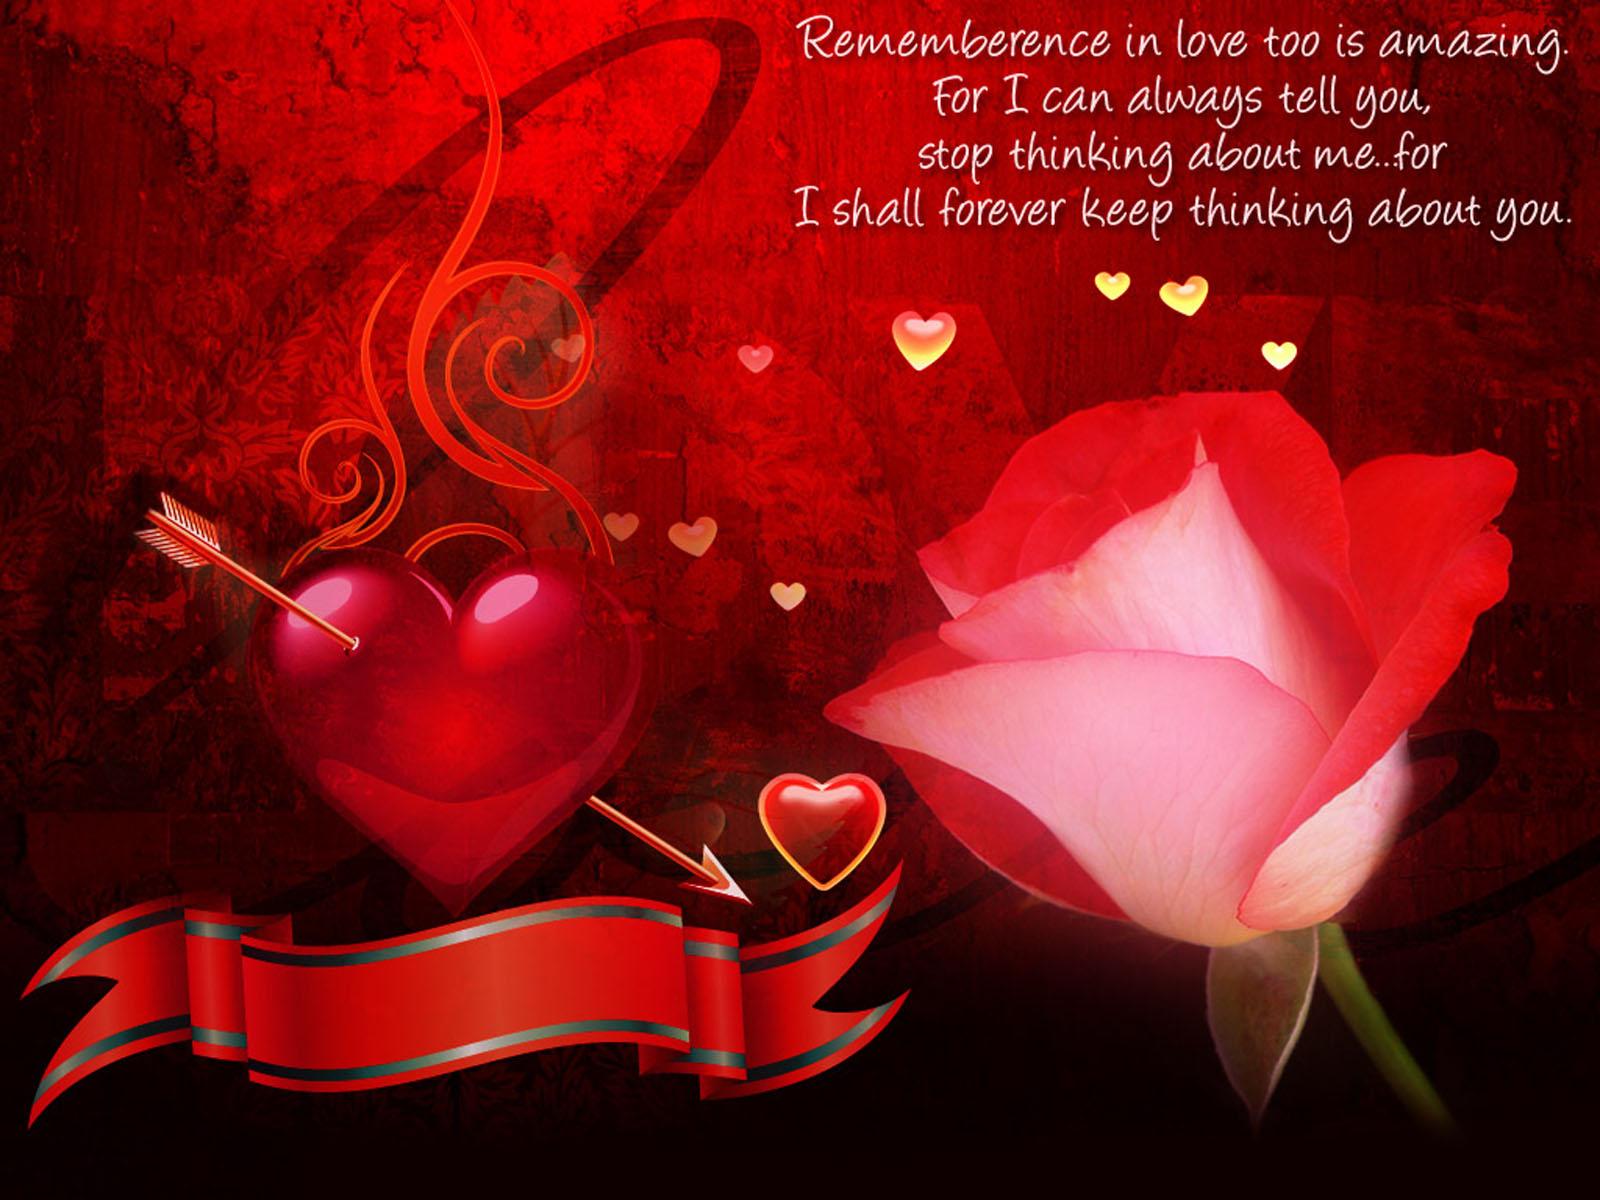 http://1.bp.blogspot.com/-H_82m0tYYb4/T6P6R-4uWlI/AAAAAAAACYA/BWqHbYLcgvQ/s1600/Love%20Quotes%204.jpg